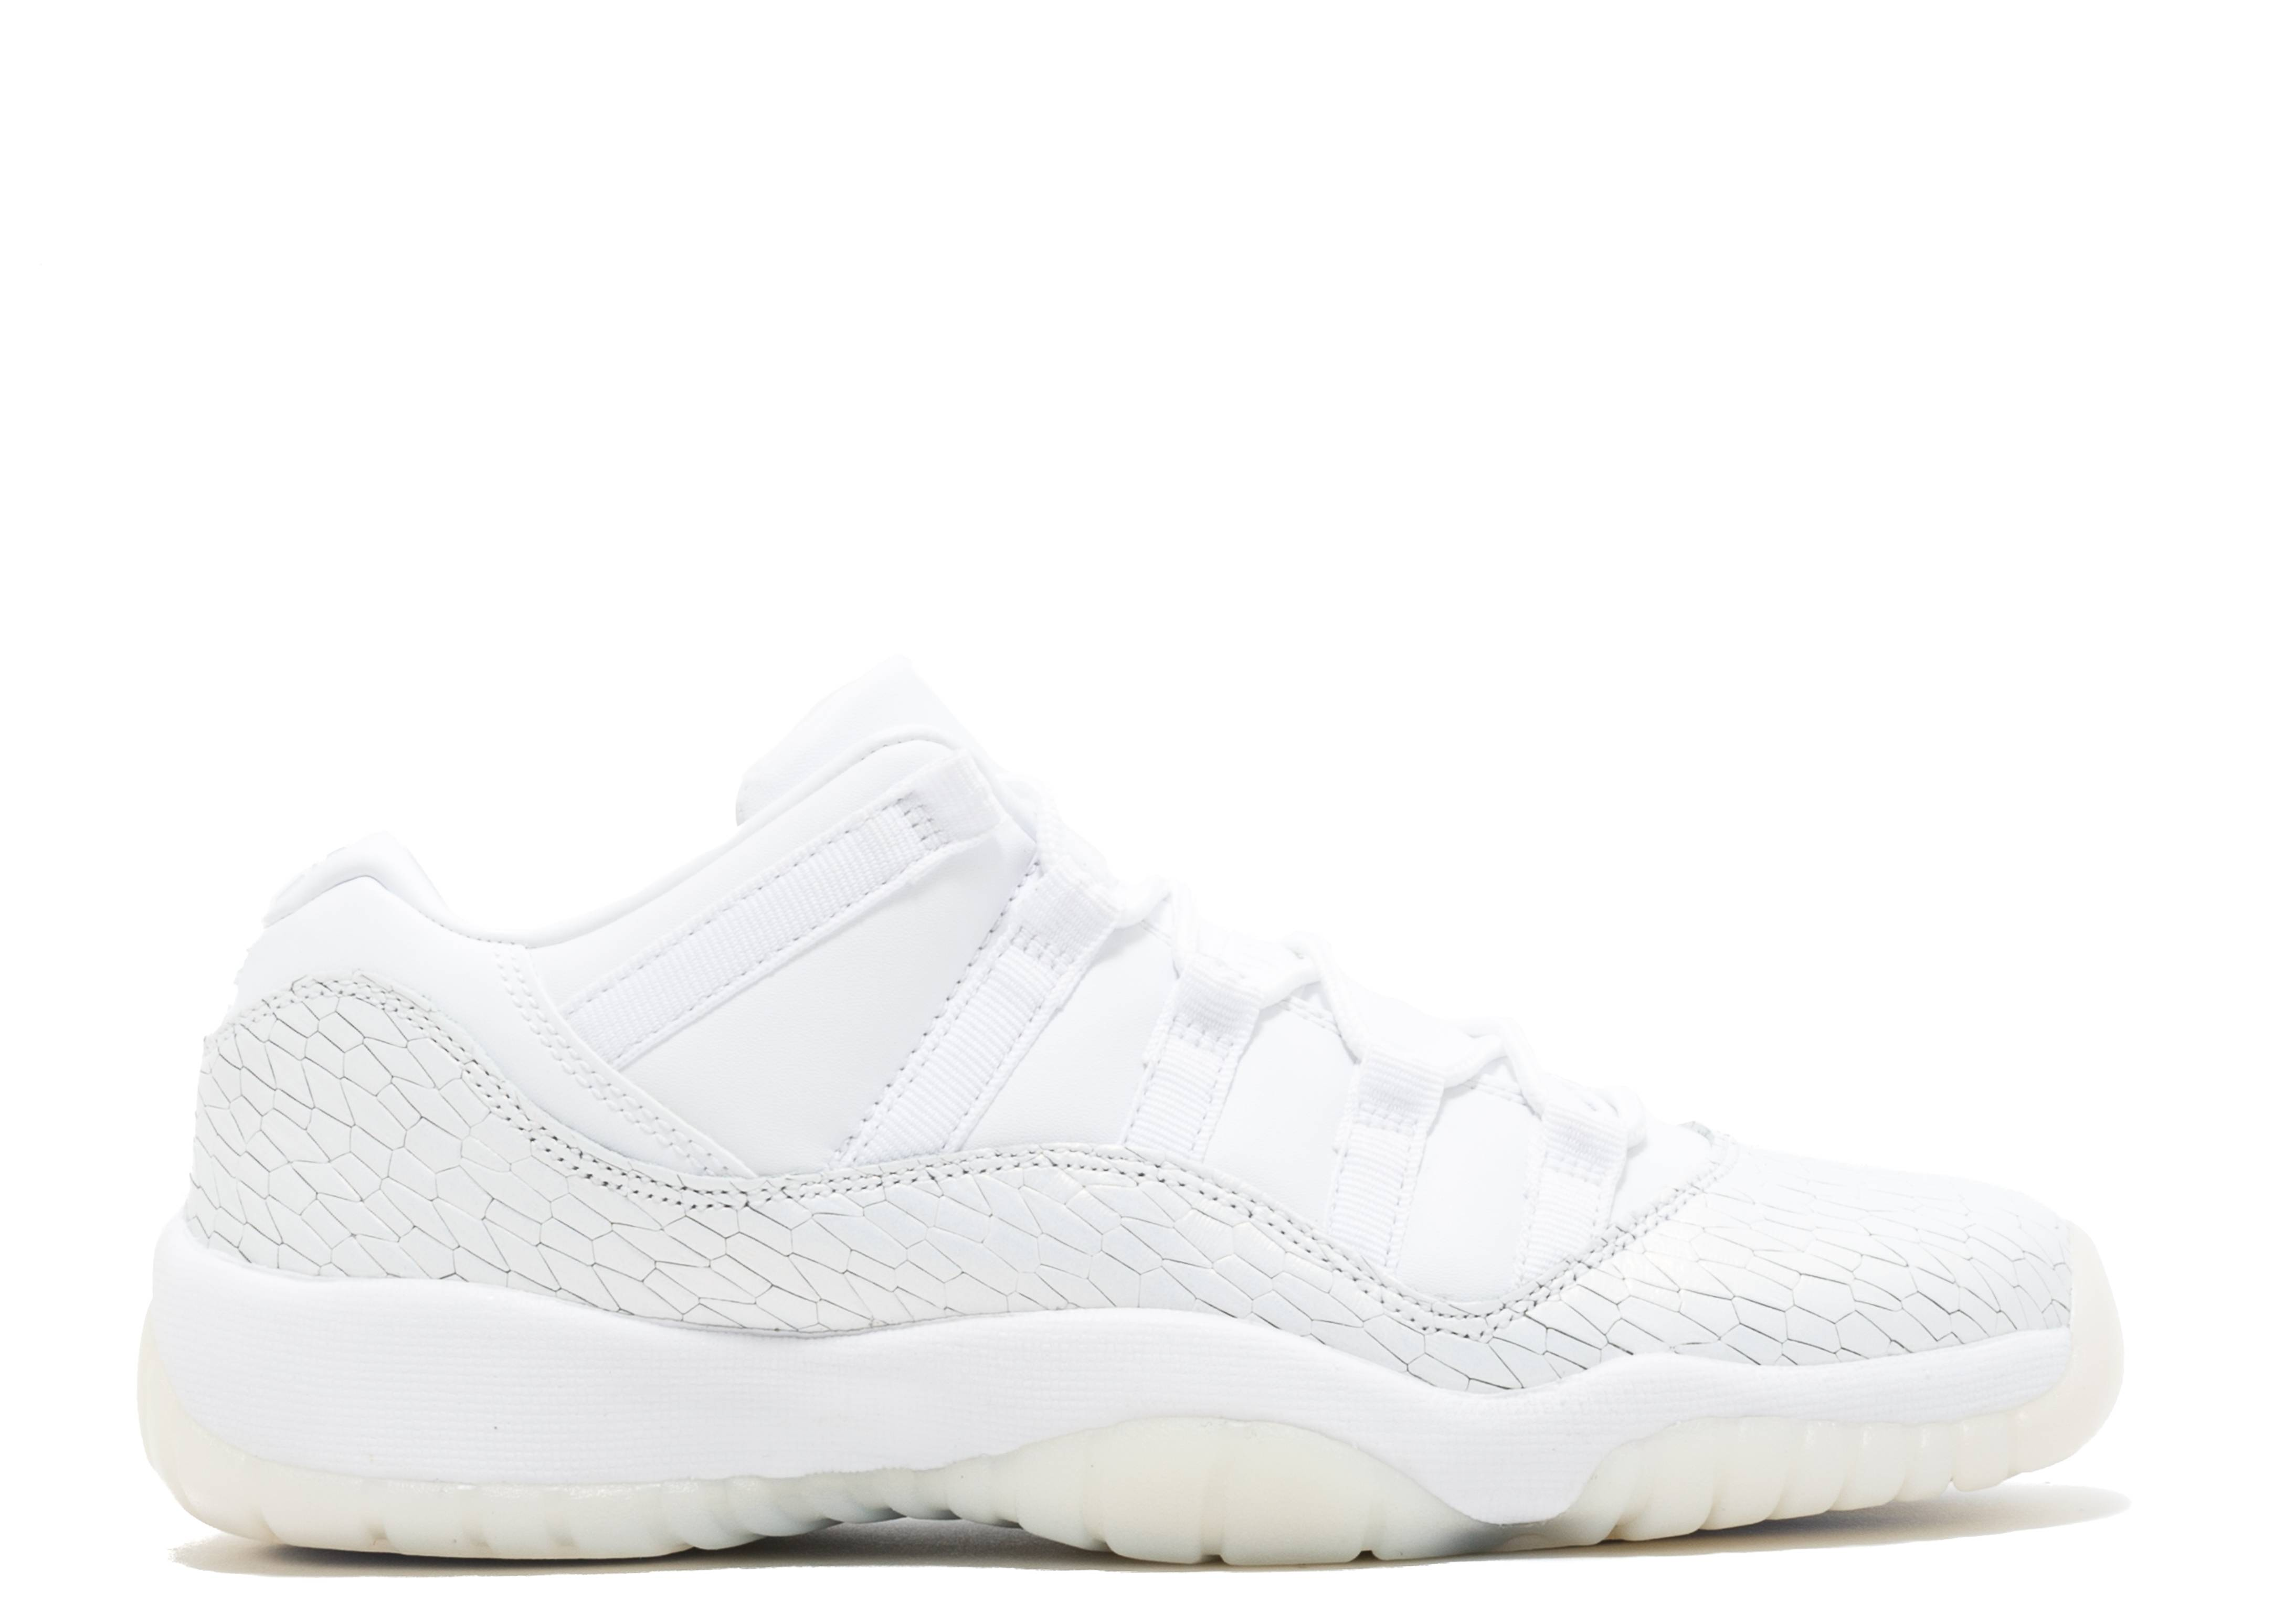 jordan 11 white